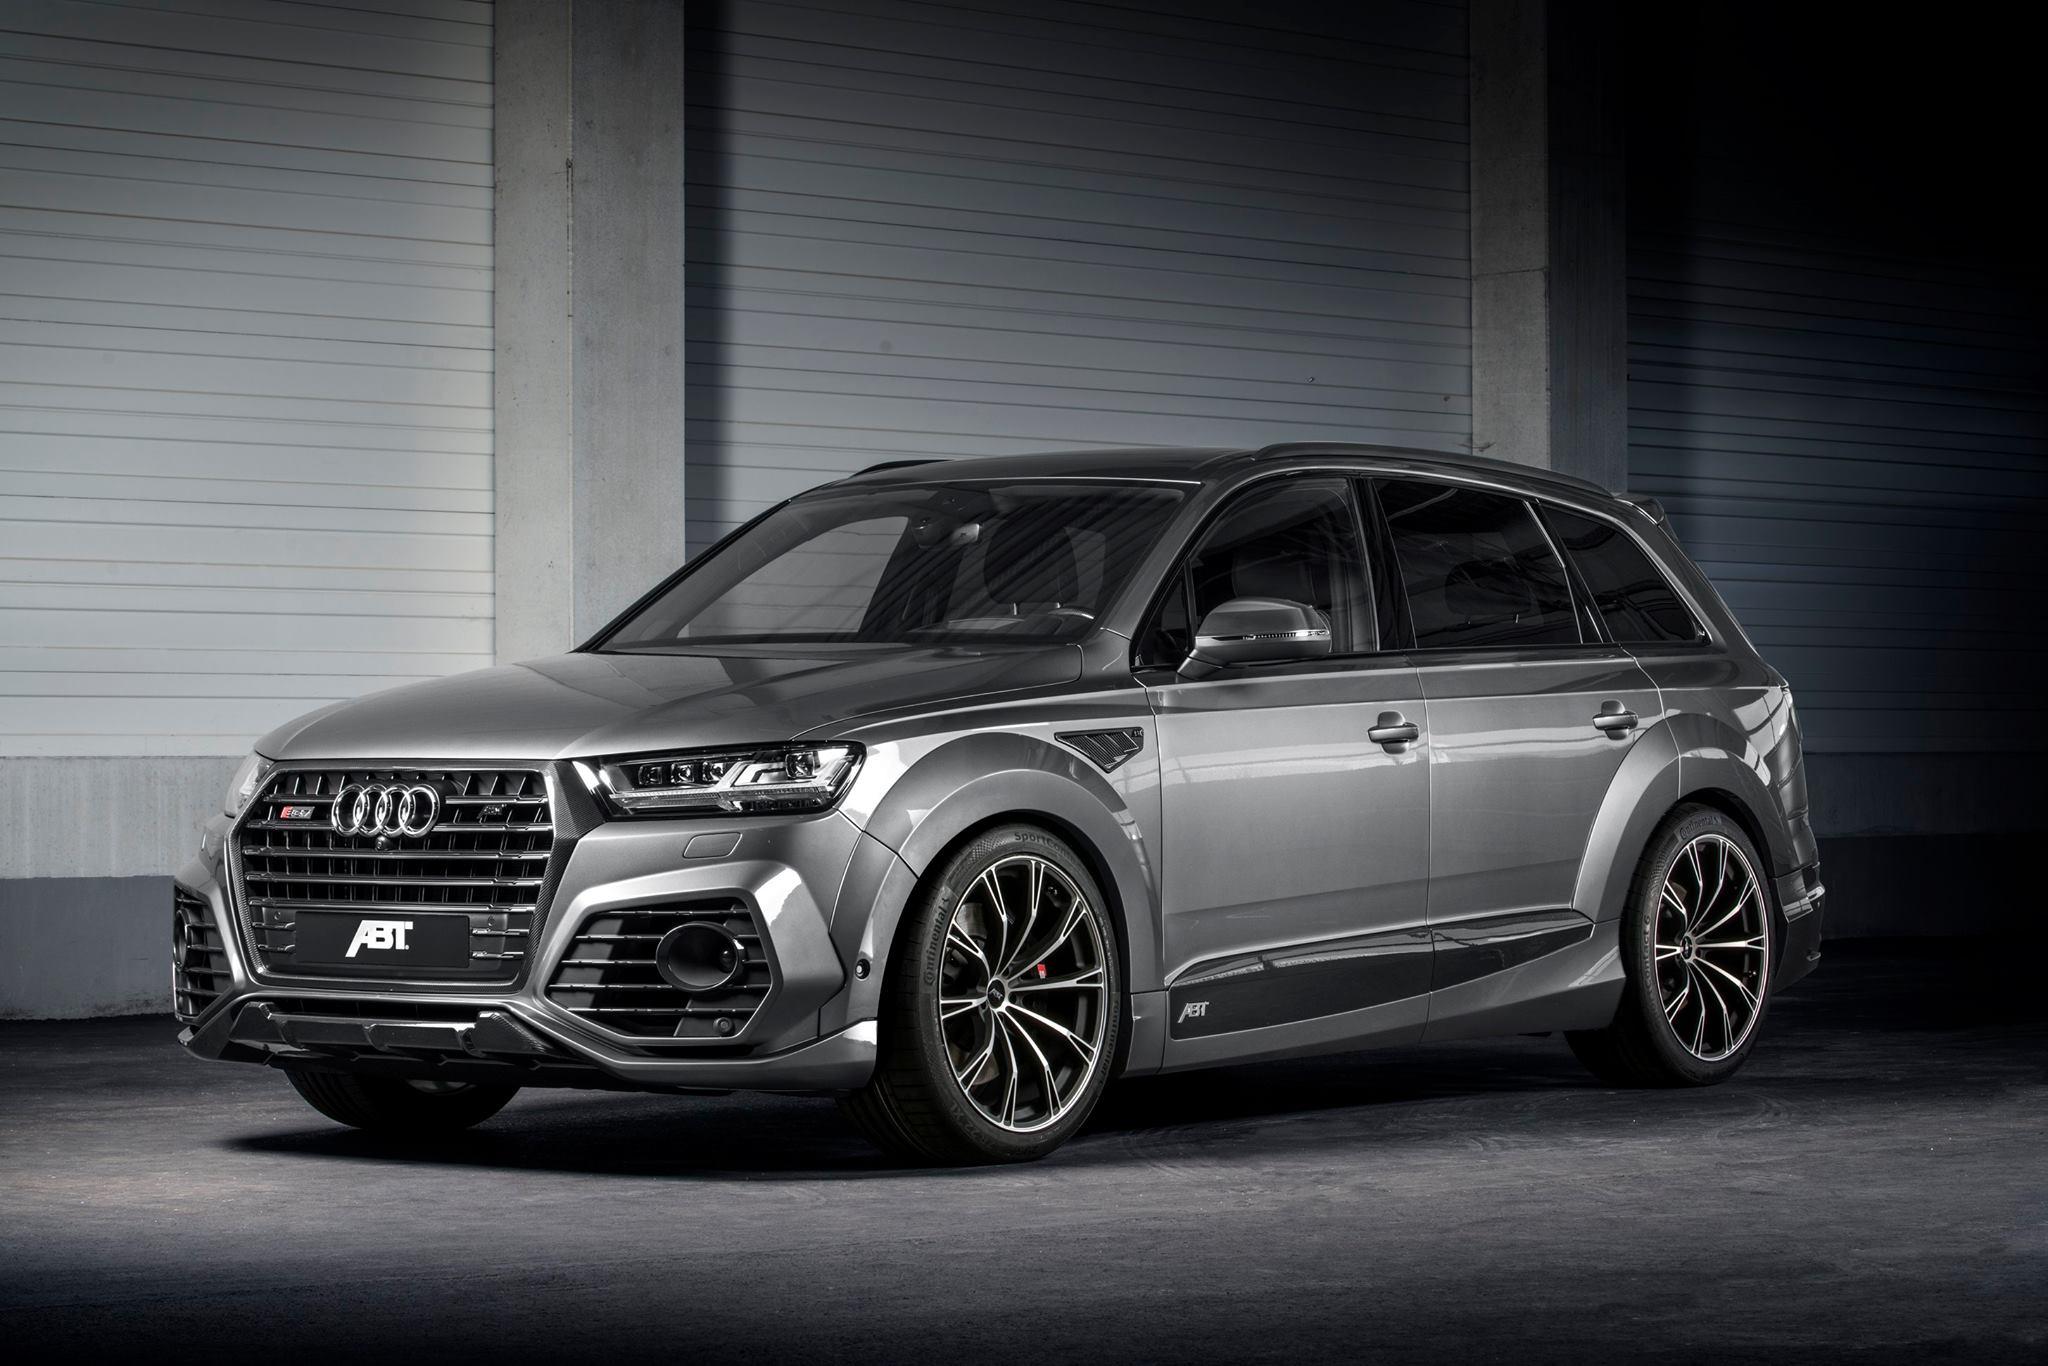 Audi ABT SQ7